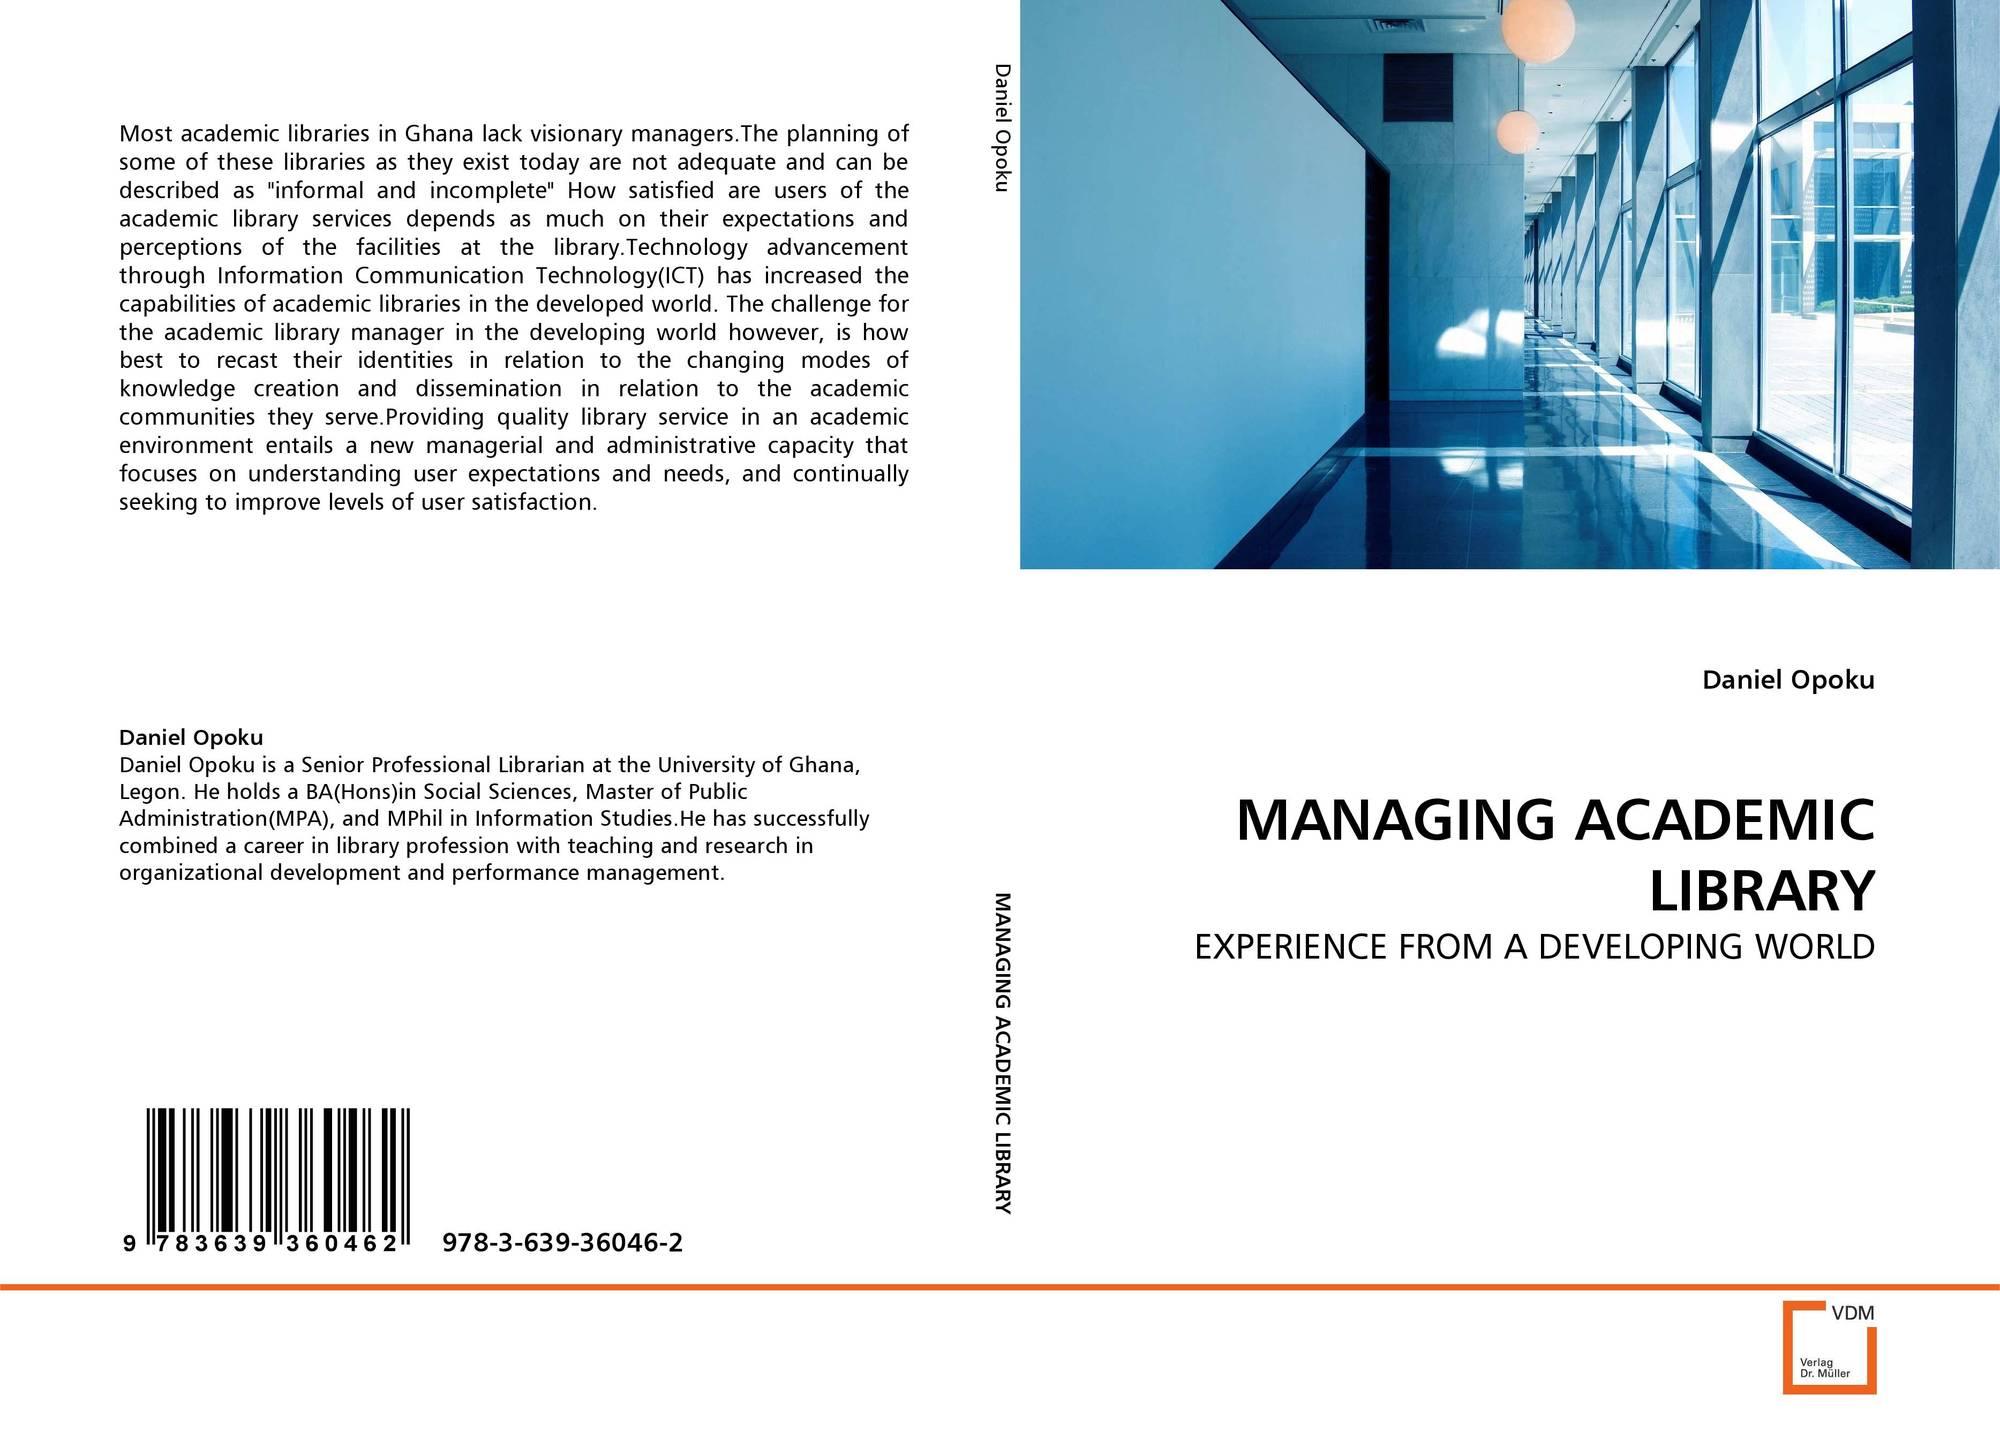 Daniel education system - Capa Do Livro De Managing Academic Library